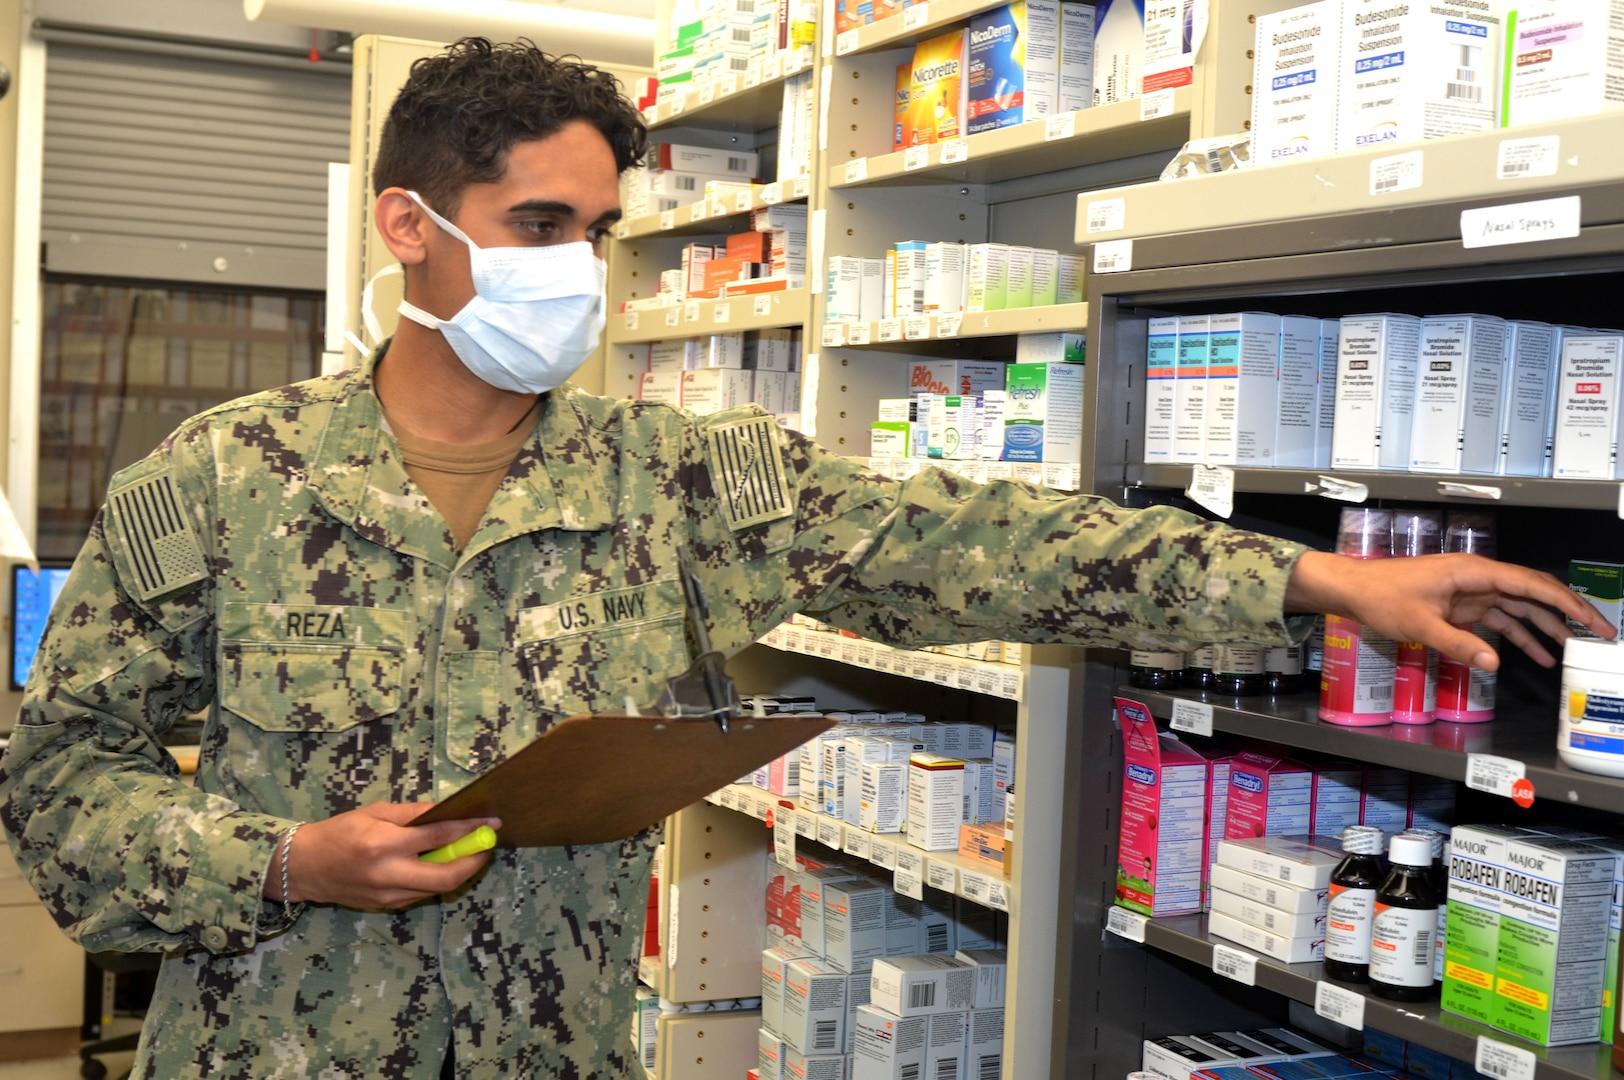 Service member reaches for medicine in pharmacy